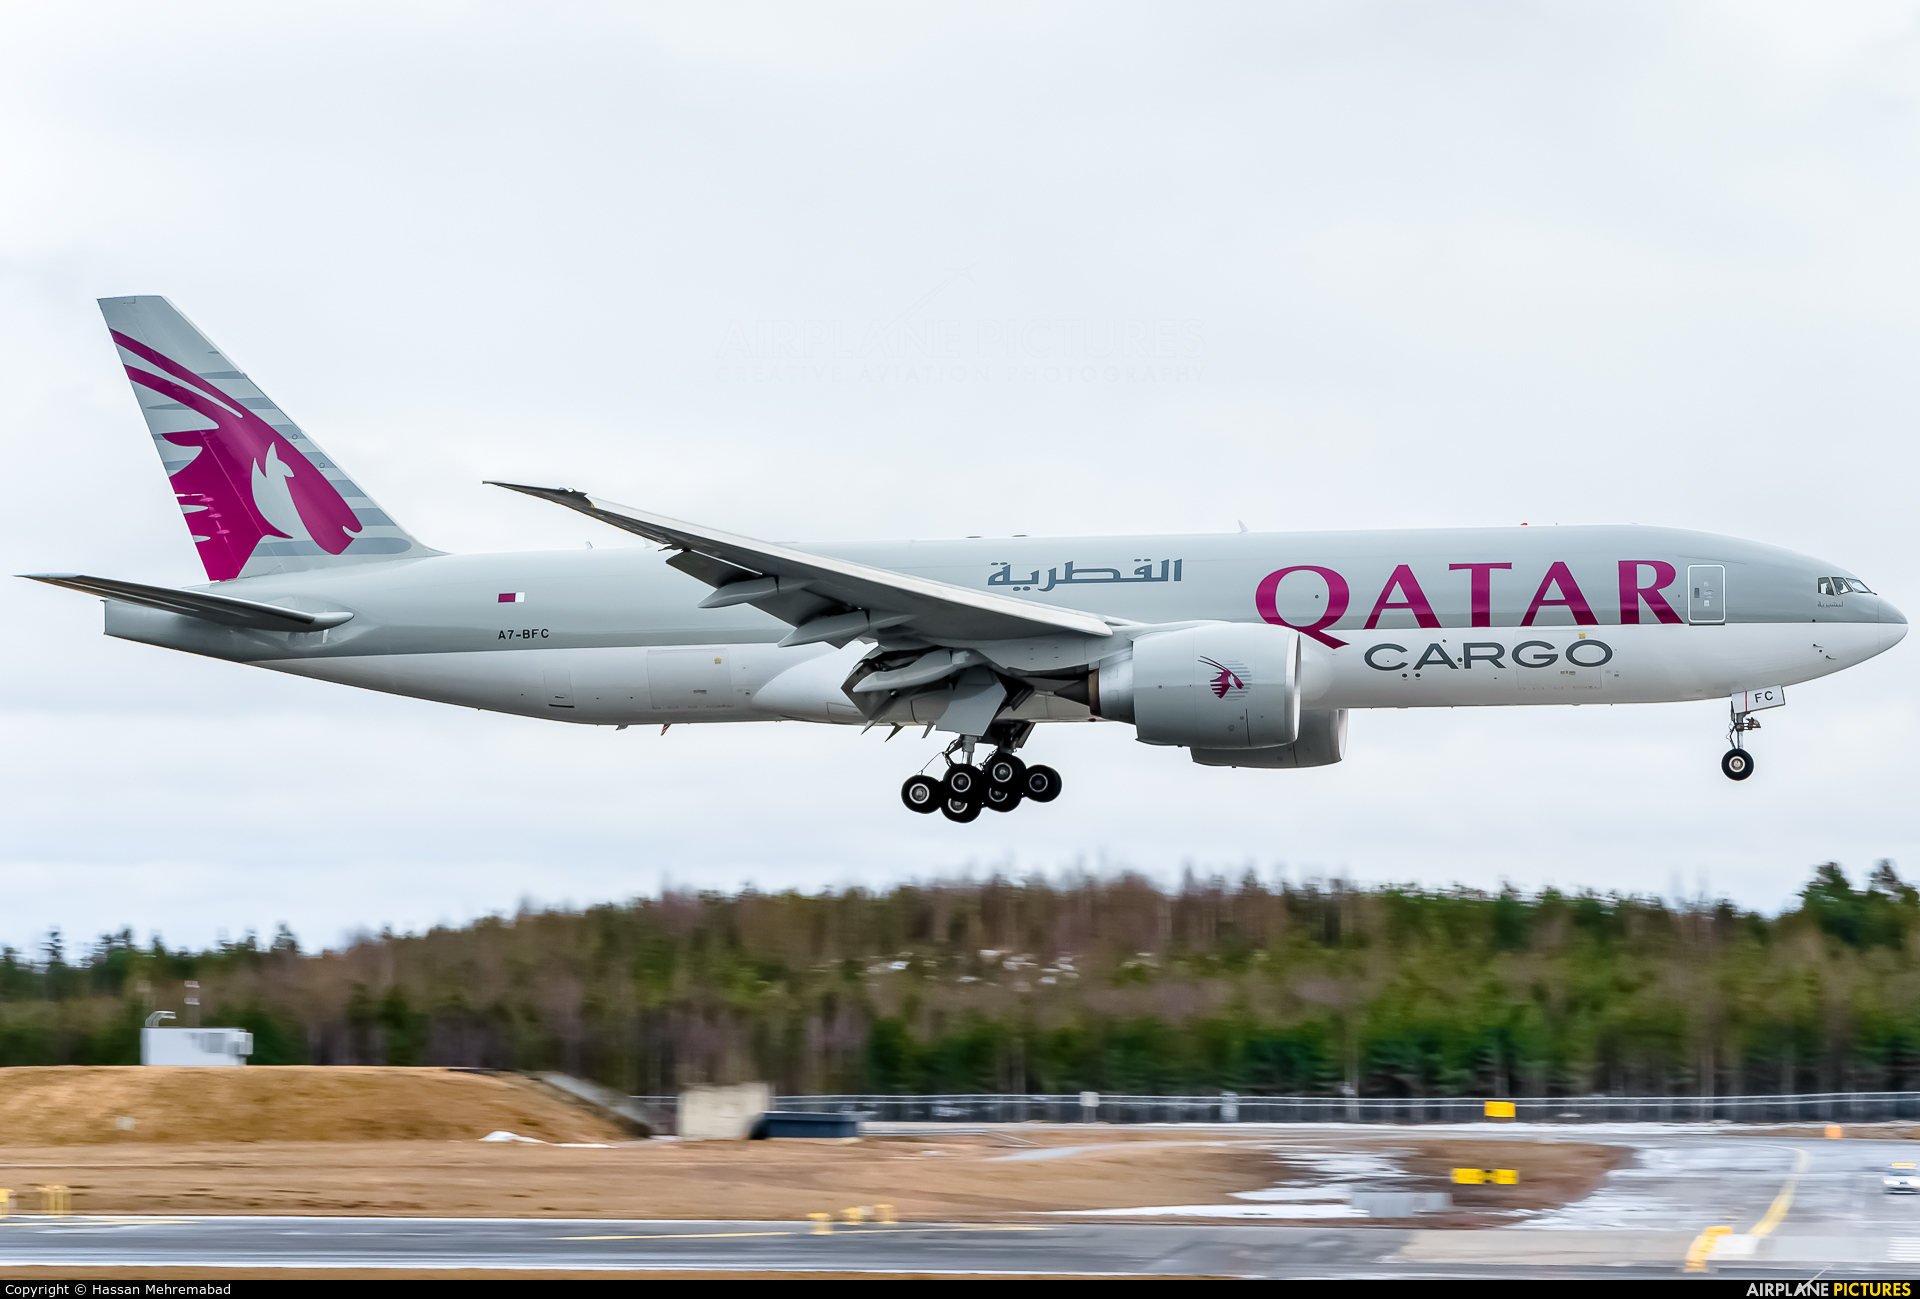 Qatar Airways Cargo A7-BFC aircraft at Oslo - Gardermoen